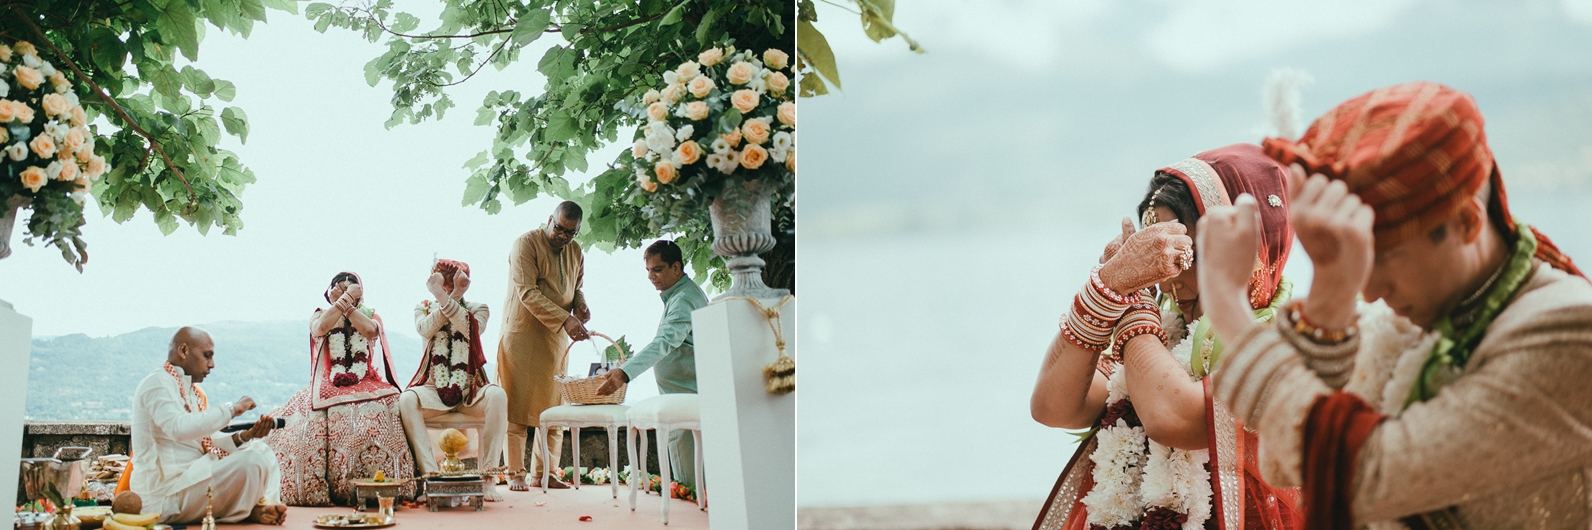 indian-wedding-photographer-italy (46).jpg